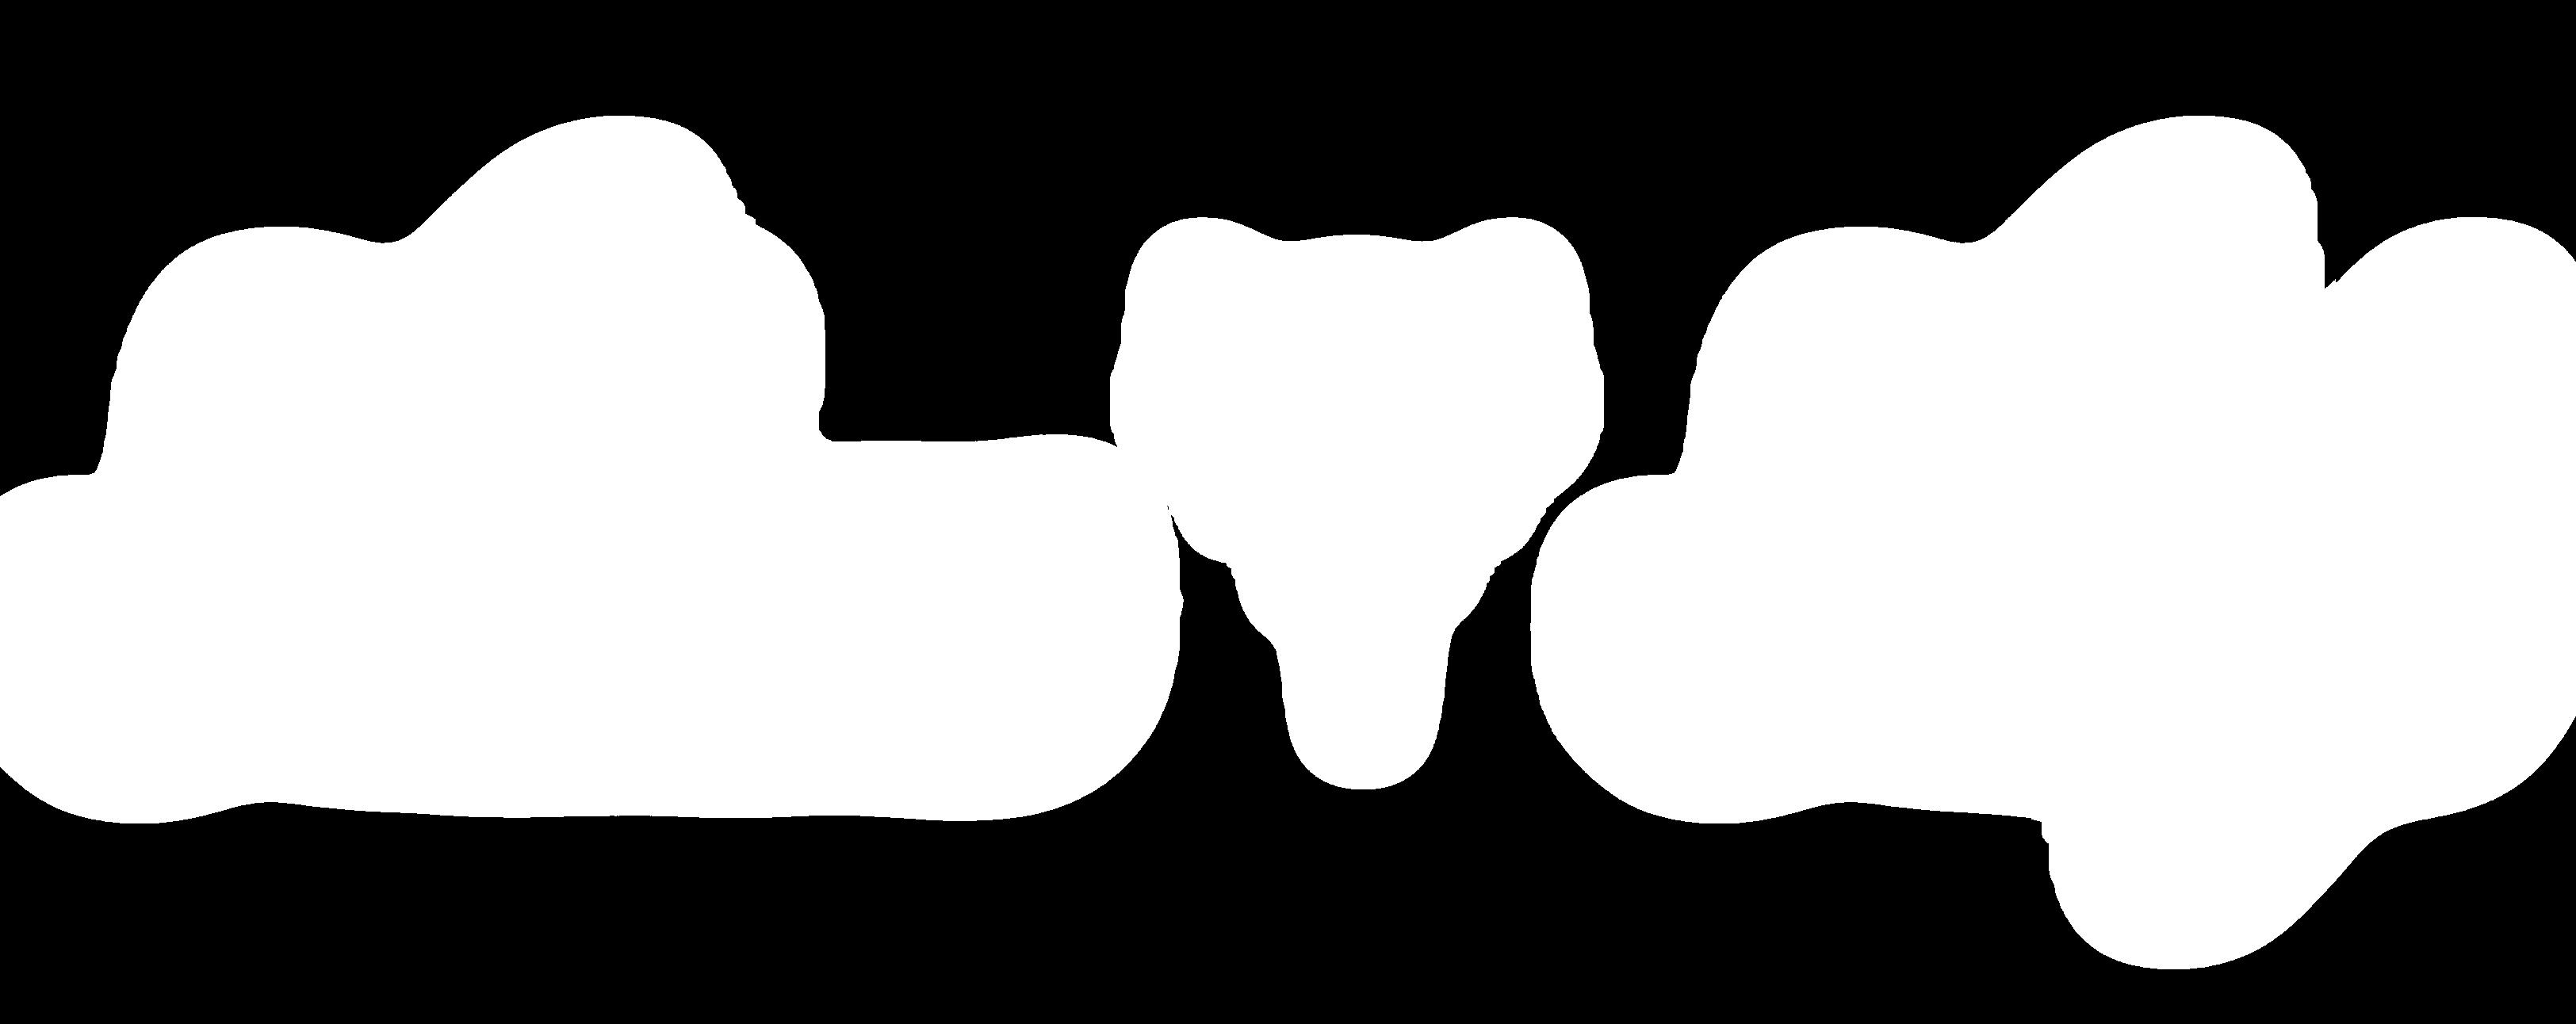 Alvens Ateljé